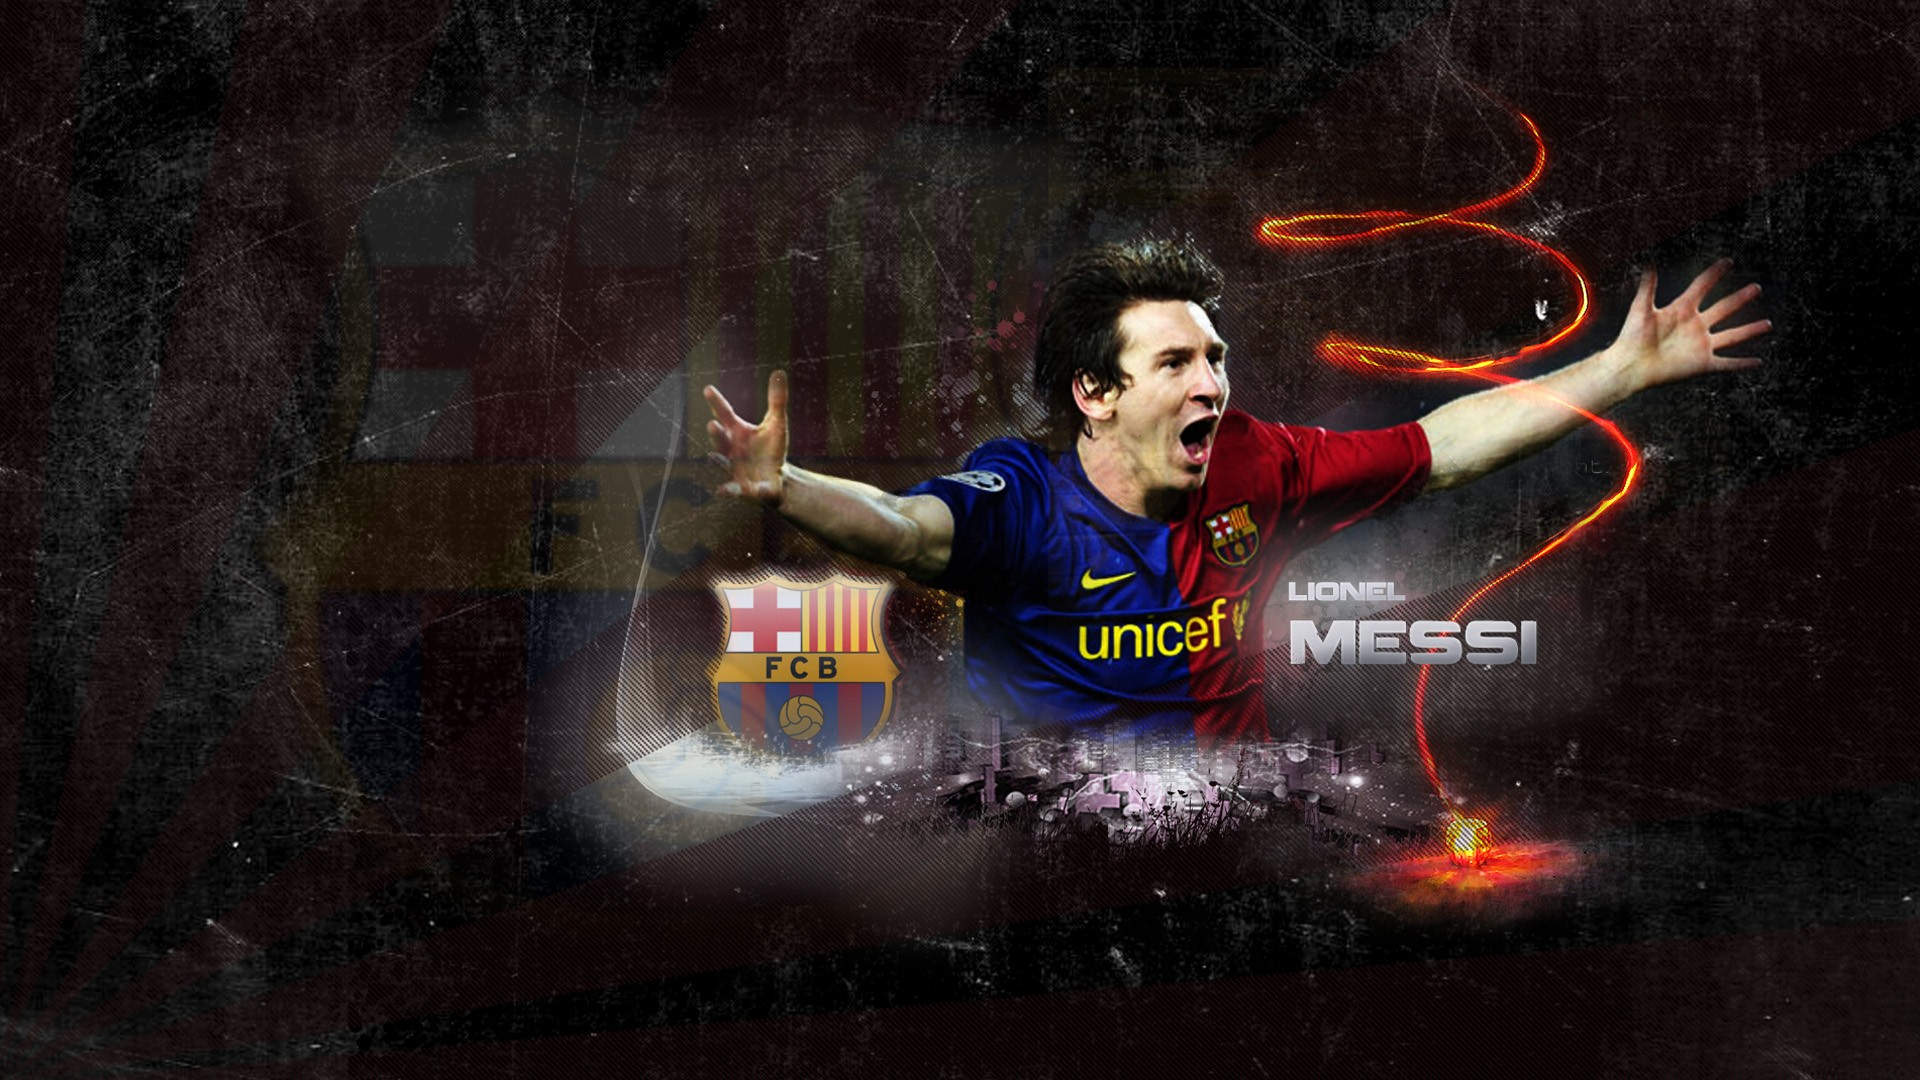 Messi Hd Wallpapers 1080p Lionel Messi 1920x1080 Backgrounds Full Hd Pixelstalk Net